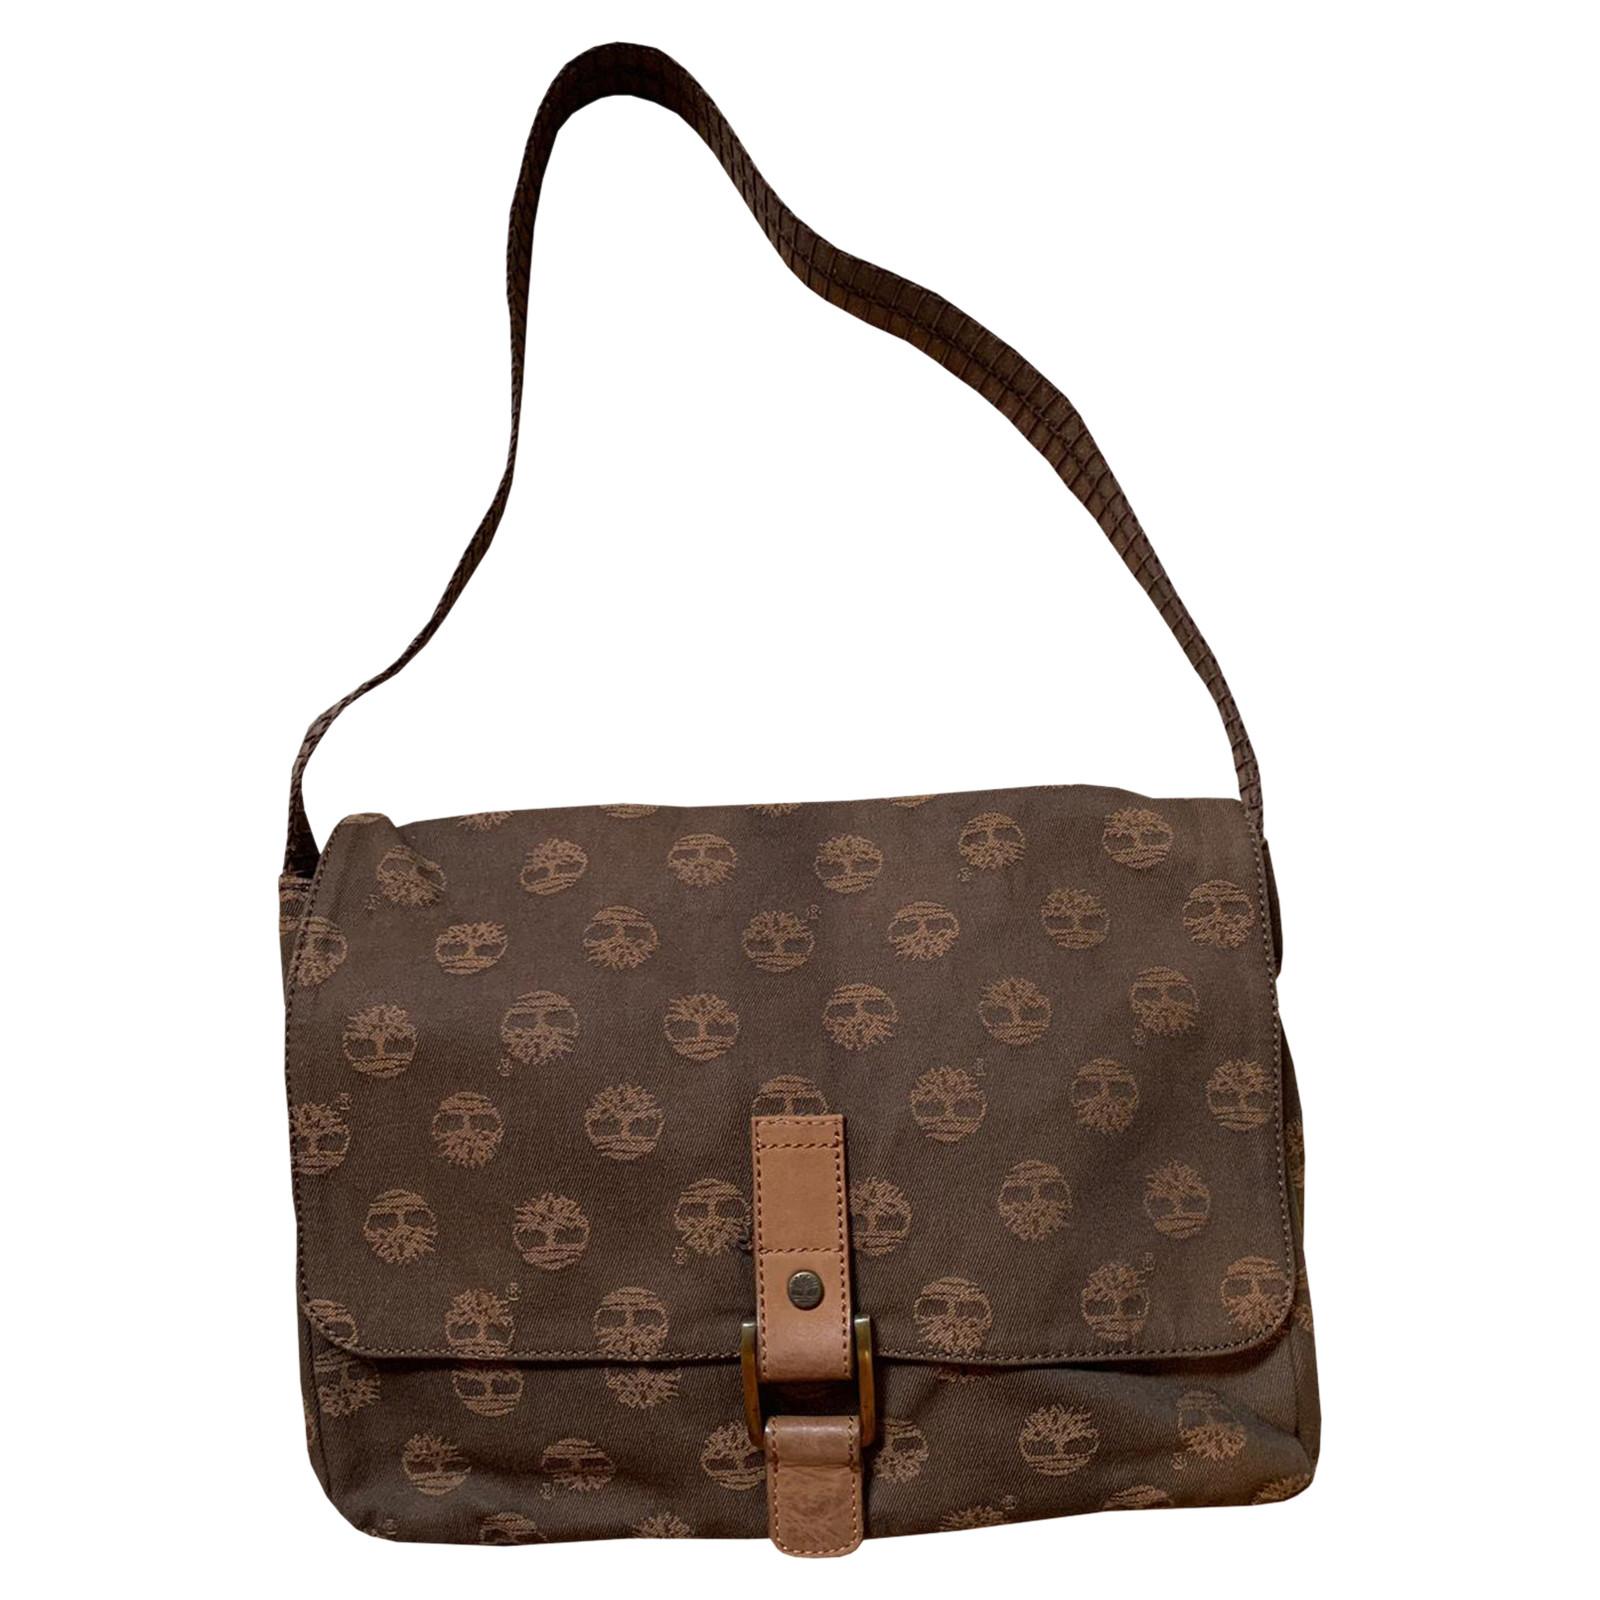 Inferir tenis salir  Timberland Shoulder bag Canvas in Brown - Second Hand Timberland Shoulder  bag Canvas in Brown buy used for 99€ (4343535)